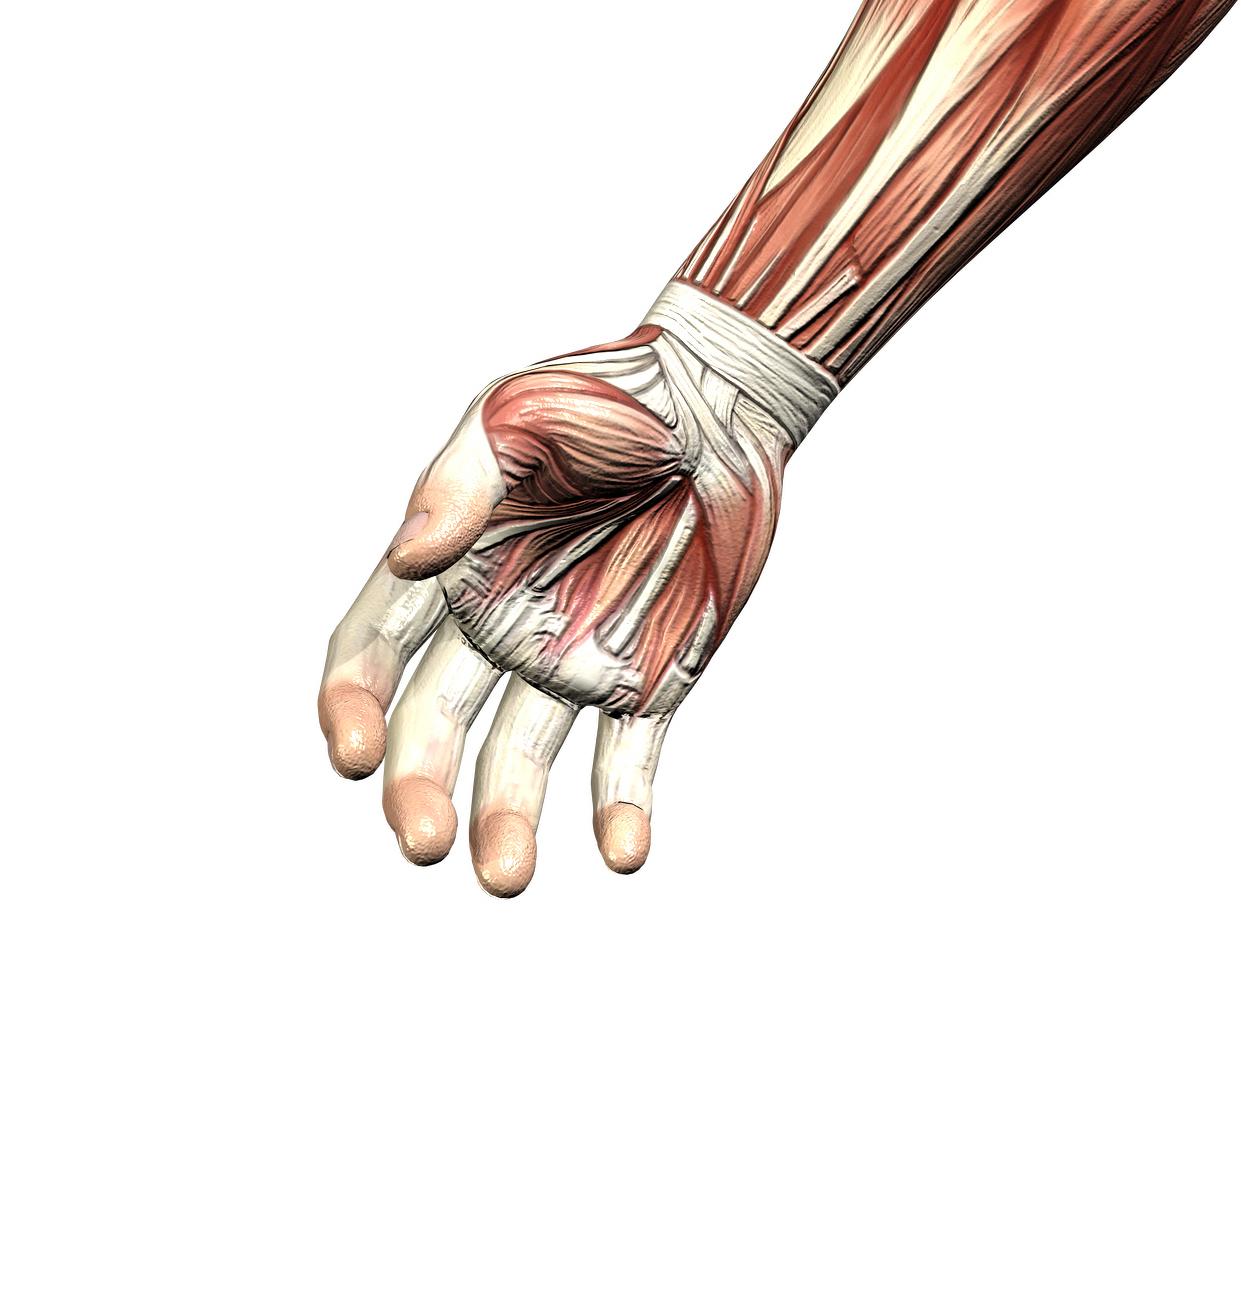 Right wrist